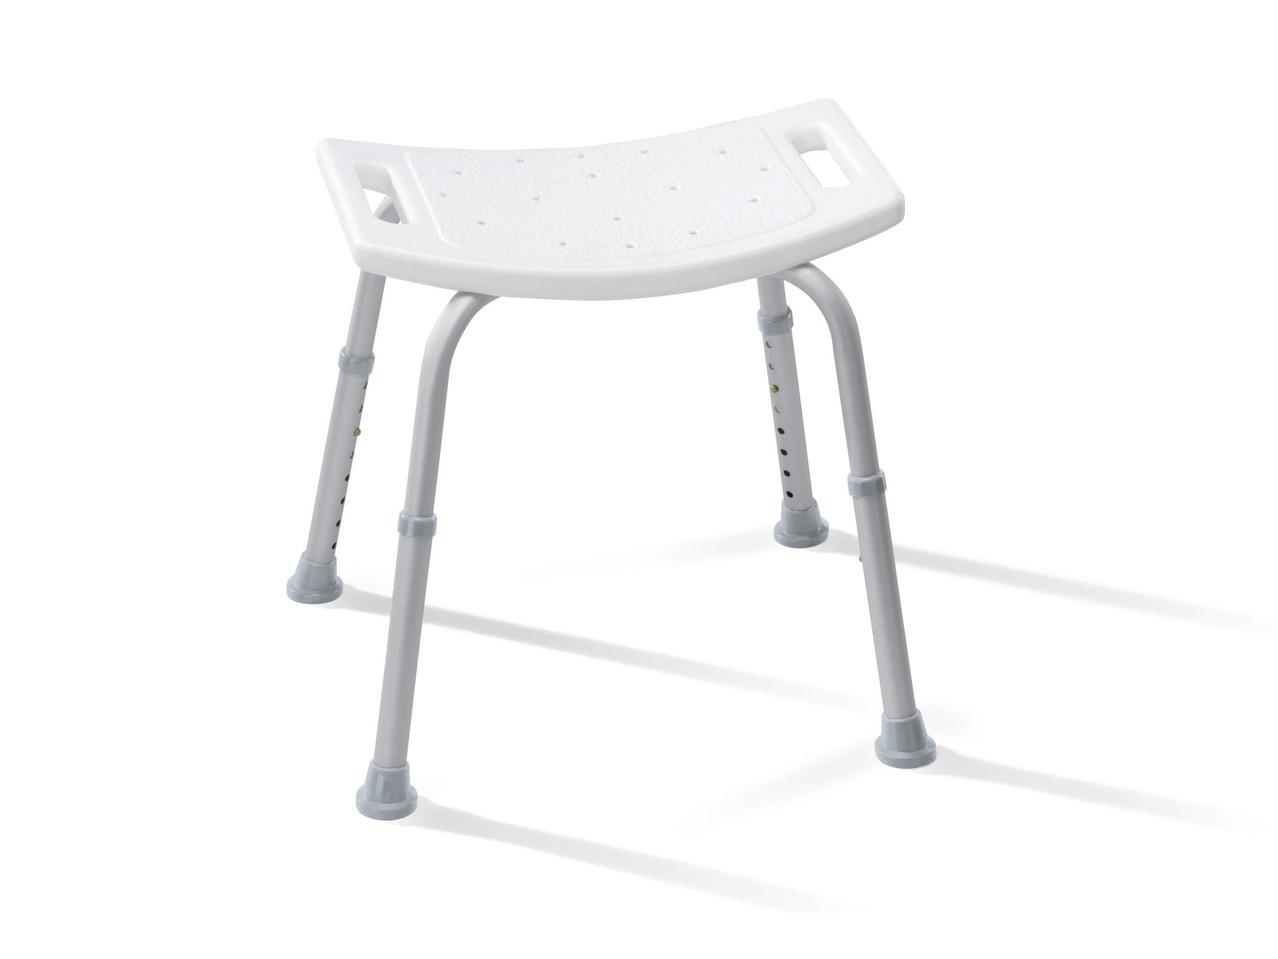 Sedile per doccia ikea tenda doccia ikea sedie plastica